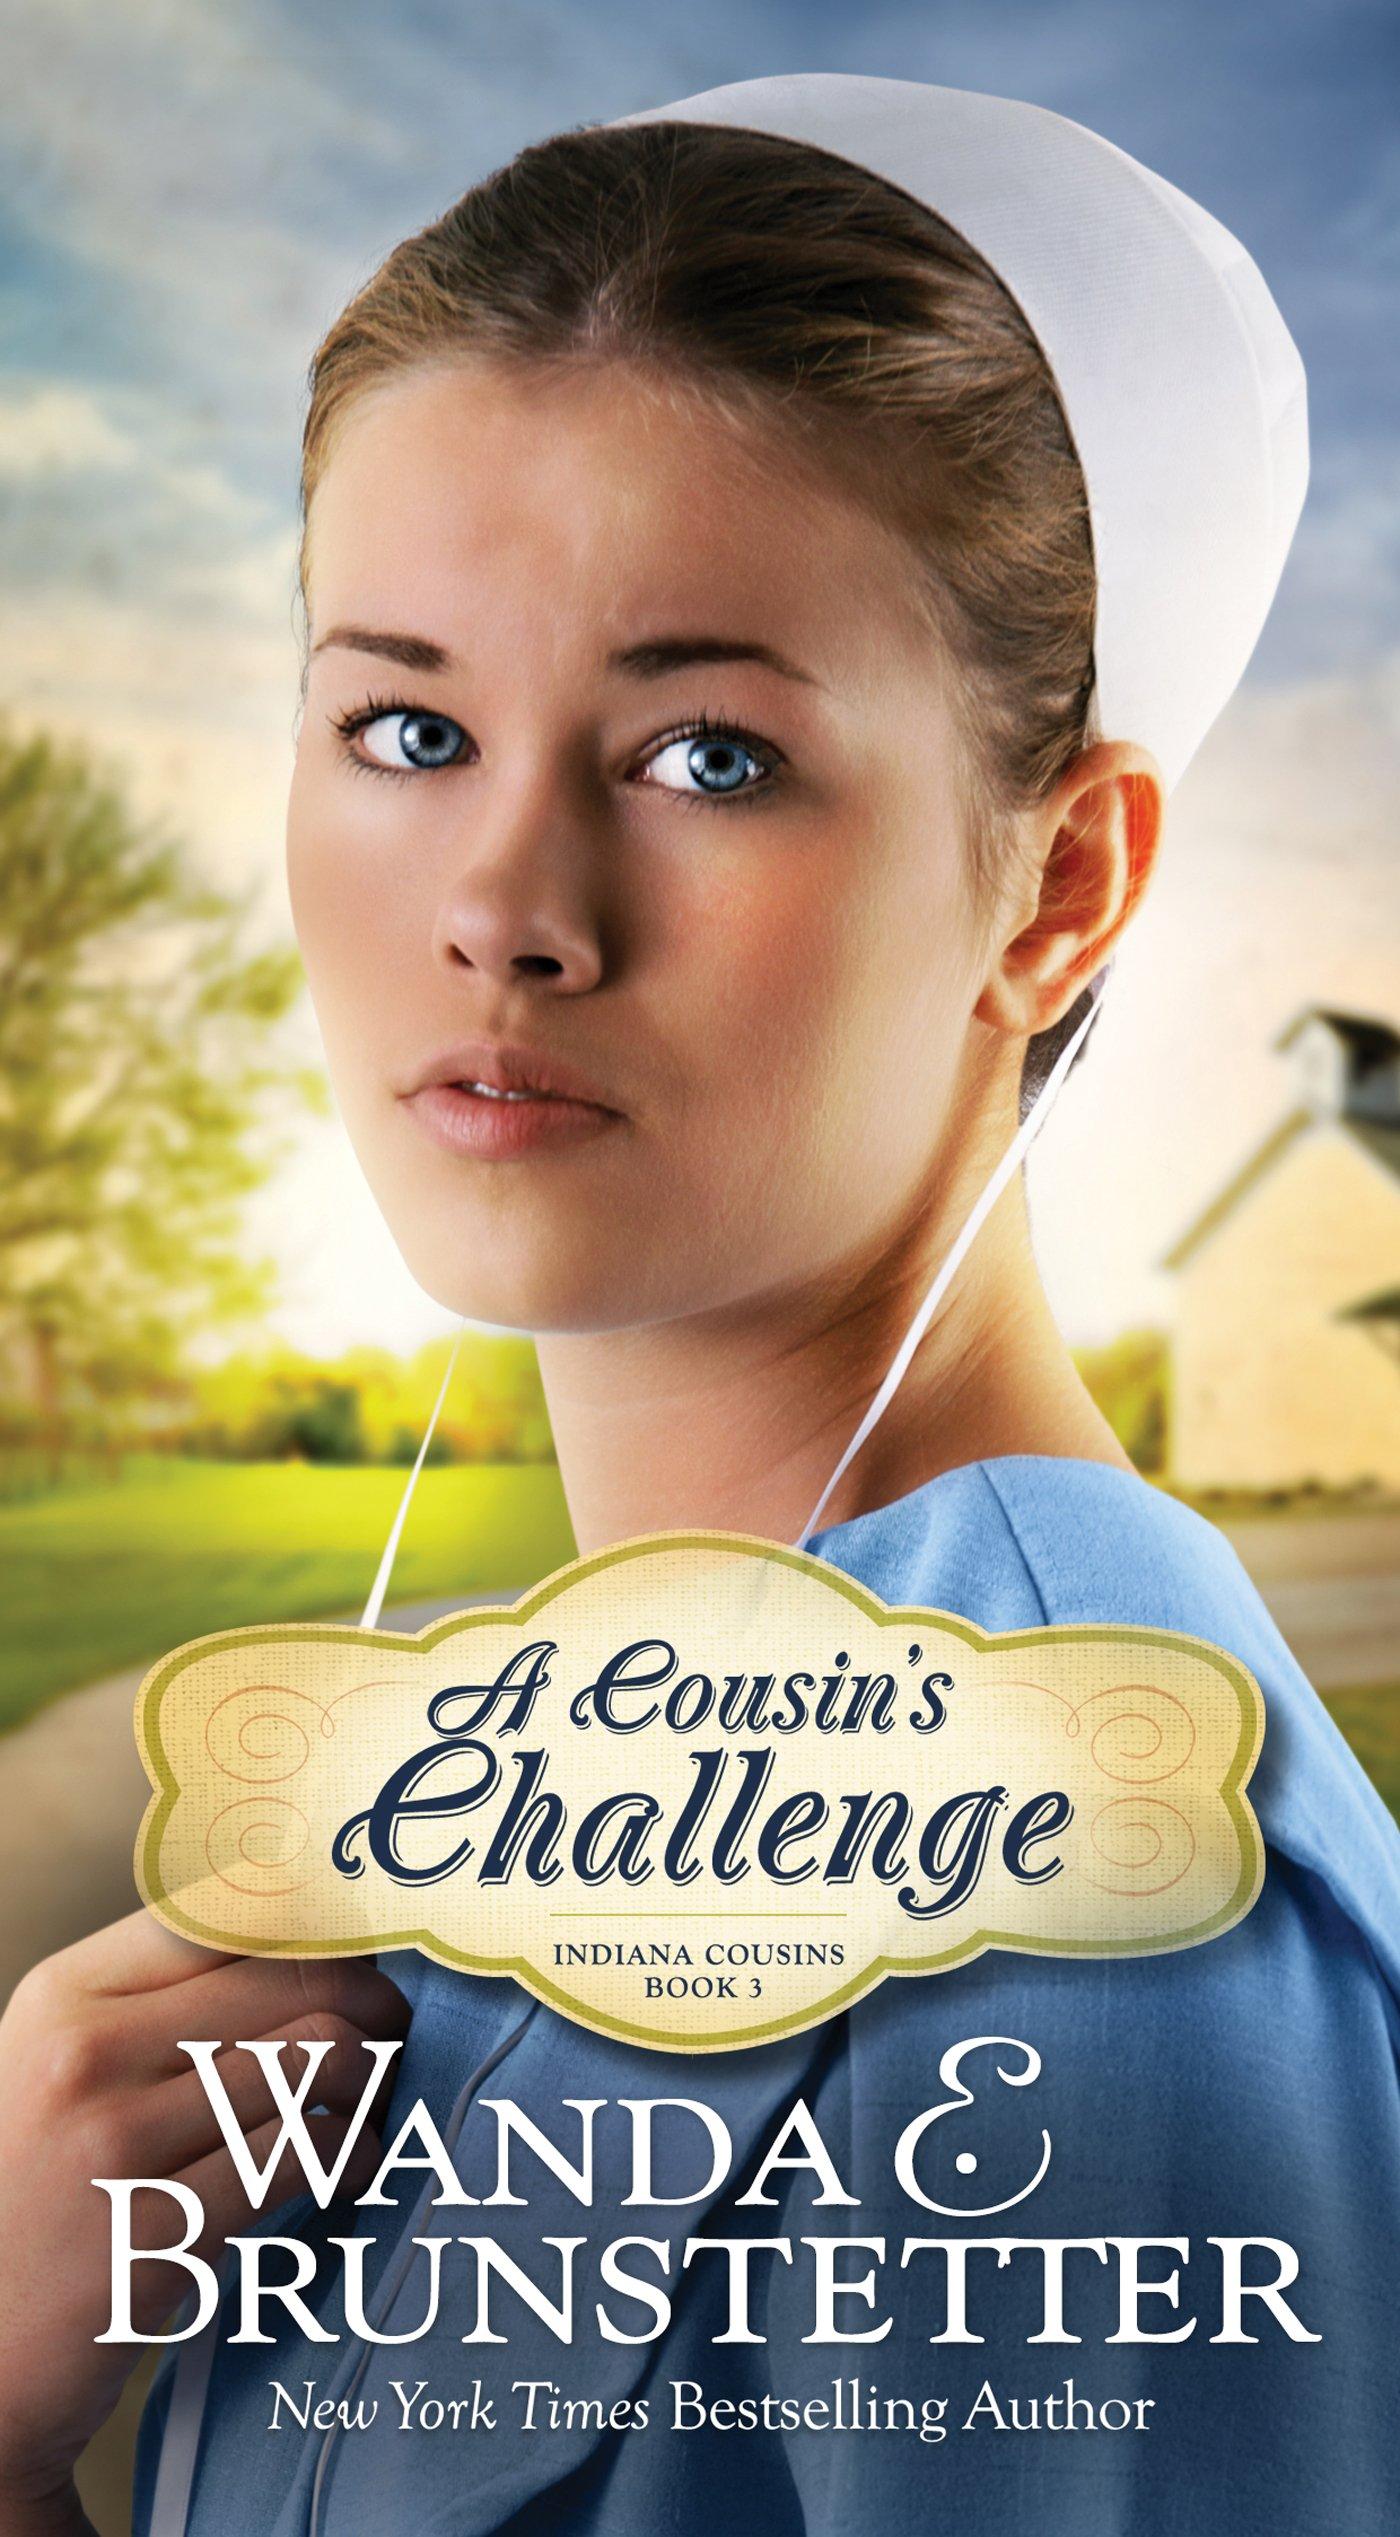 A Cousin's Challenge (Indiana Cousins): Wanda E. Brunstetter:  9781683220688: Amazon.com: Books